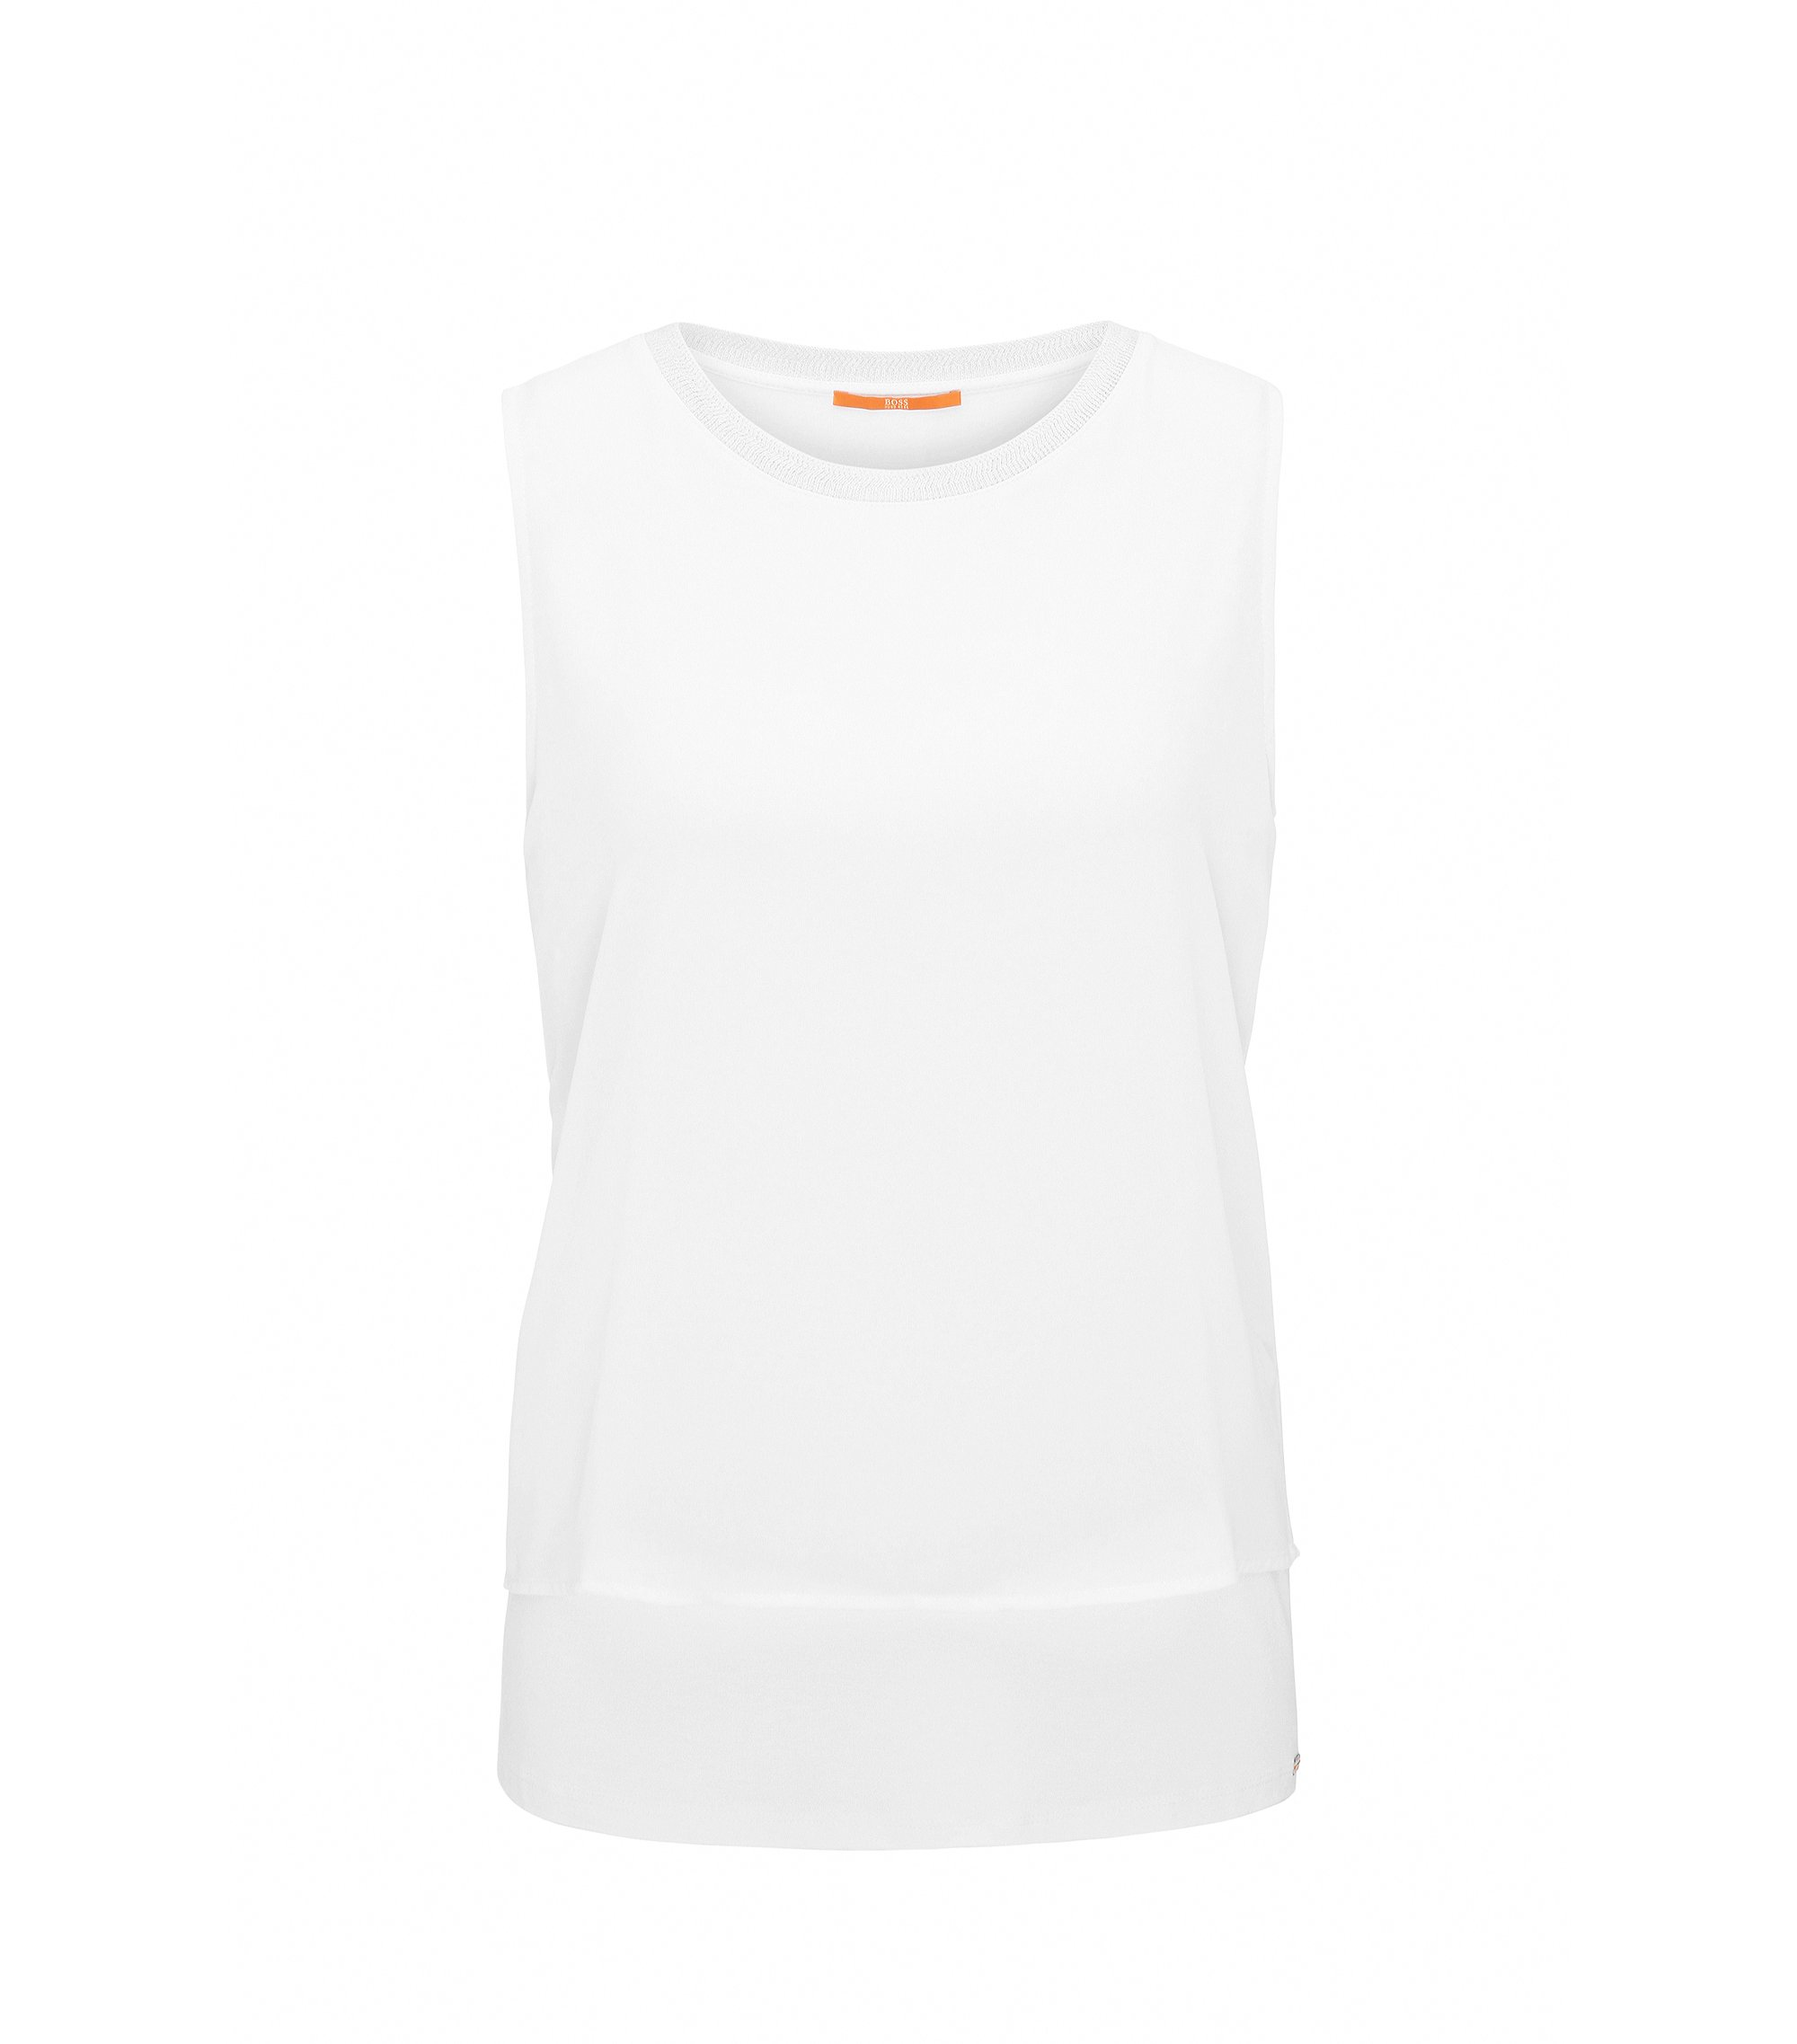 Top senza maniche regular fit in jersey elasticizzato, Bianco